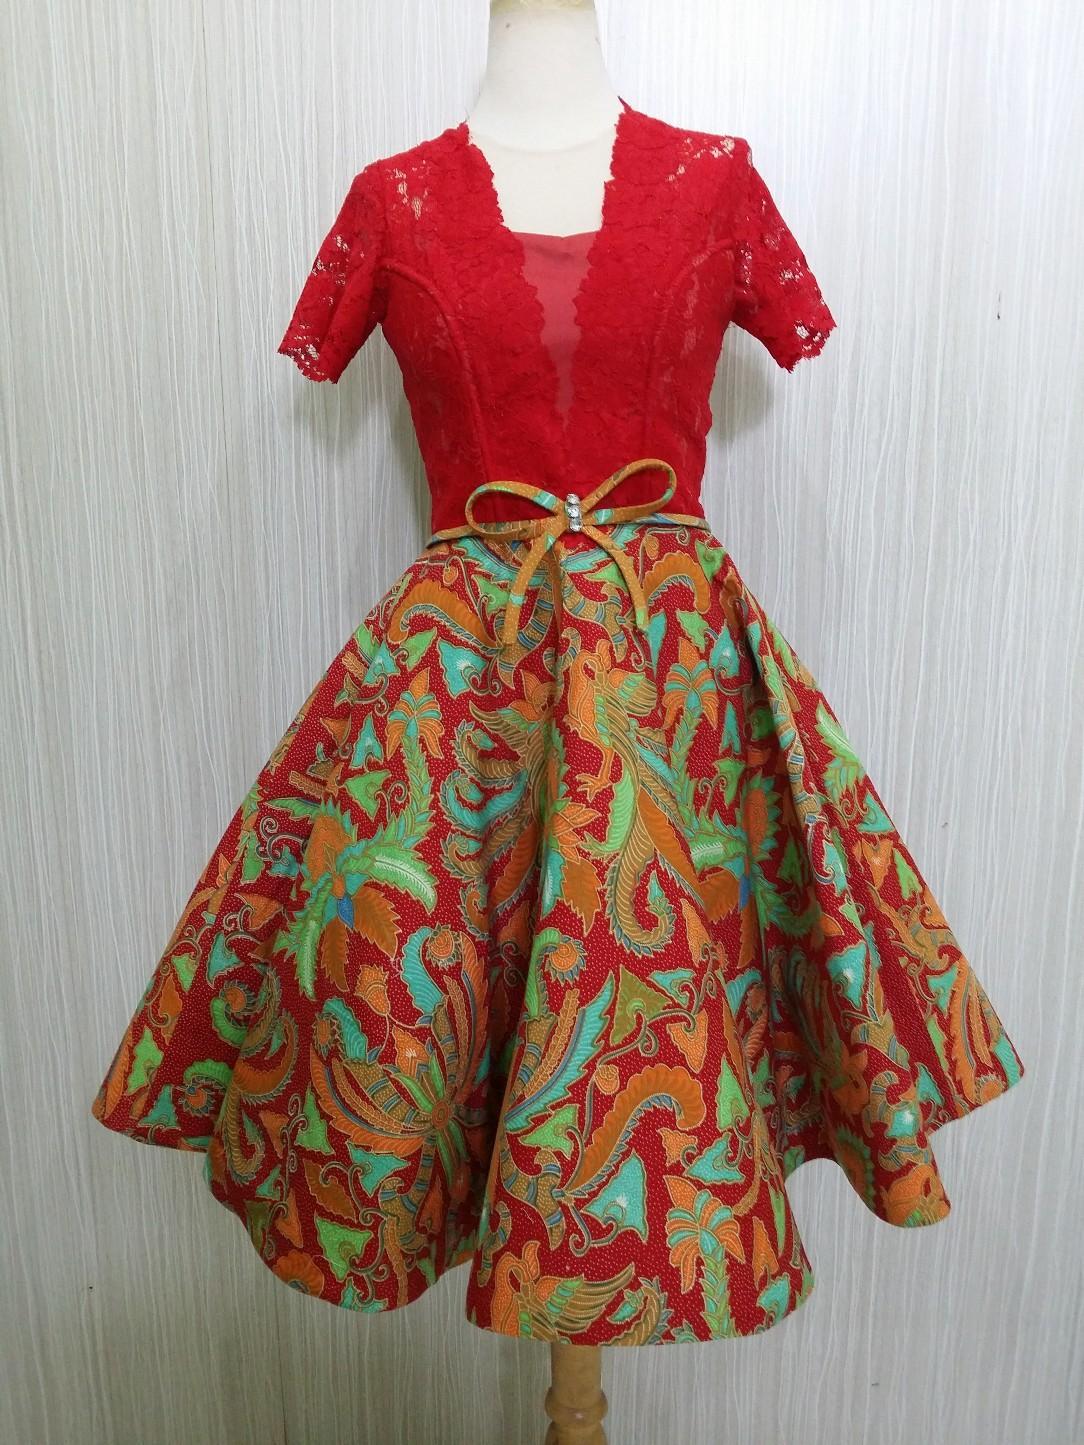 Dress Batik Pesta Modern Katun Kombinasi Brokat Dress Batik Modern Mekar Merah DRS MEKAR RR1784 MR